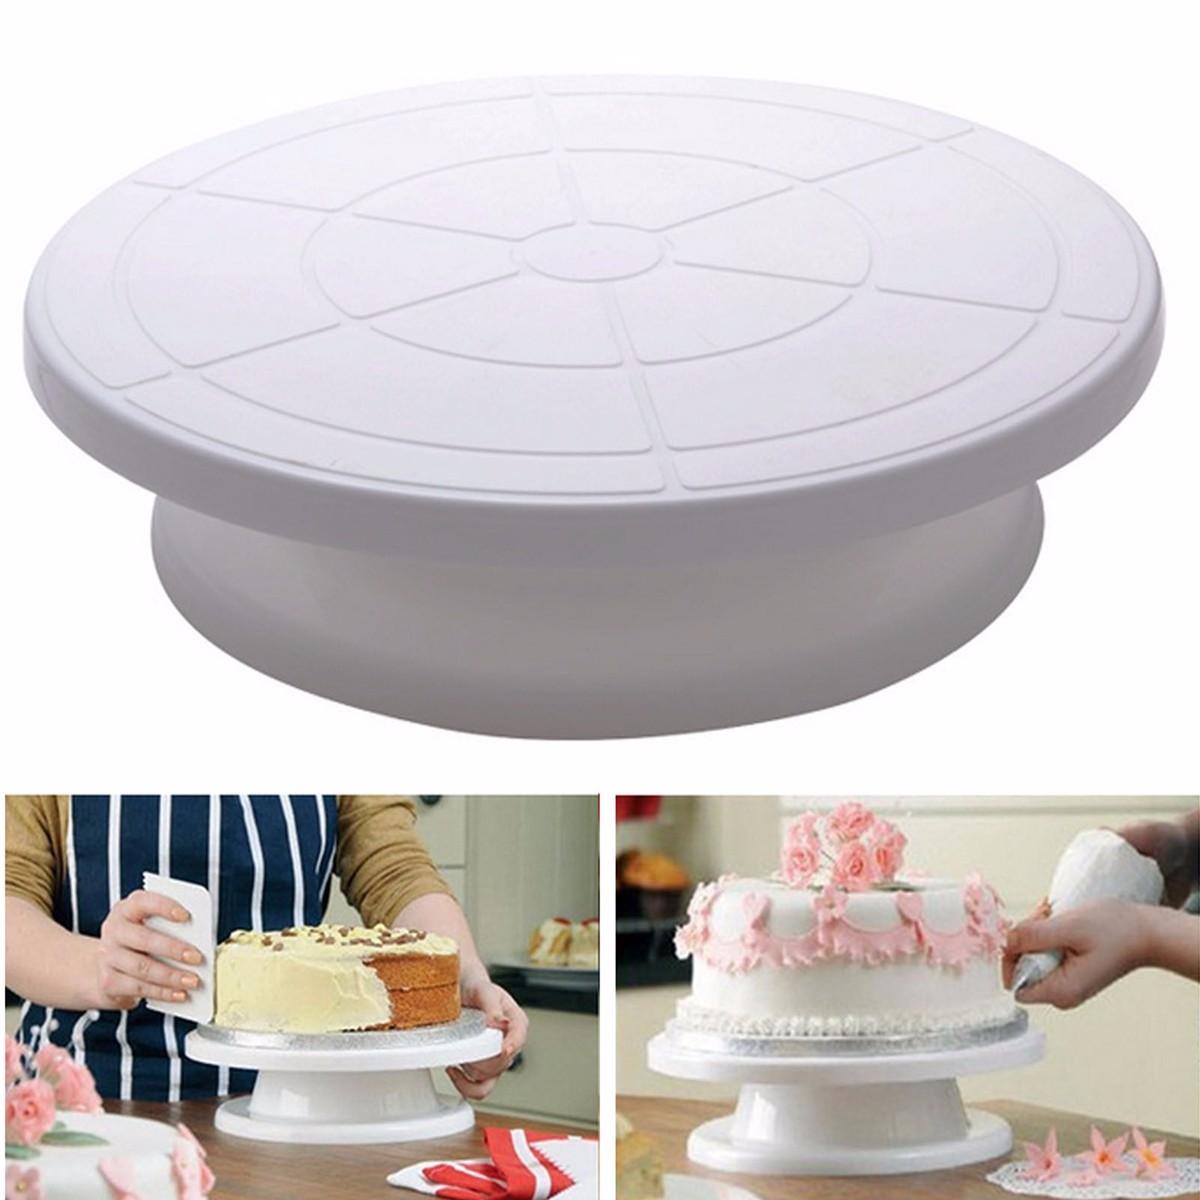 Kitchen Design Cake: 28cm Kitchen Cake Decorating Icing Rotating Turntable